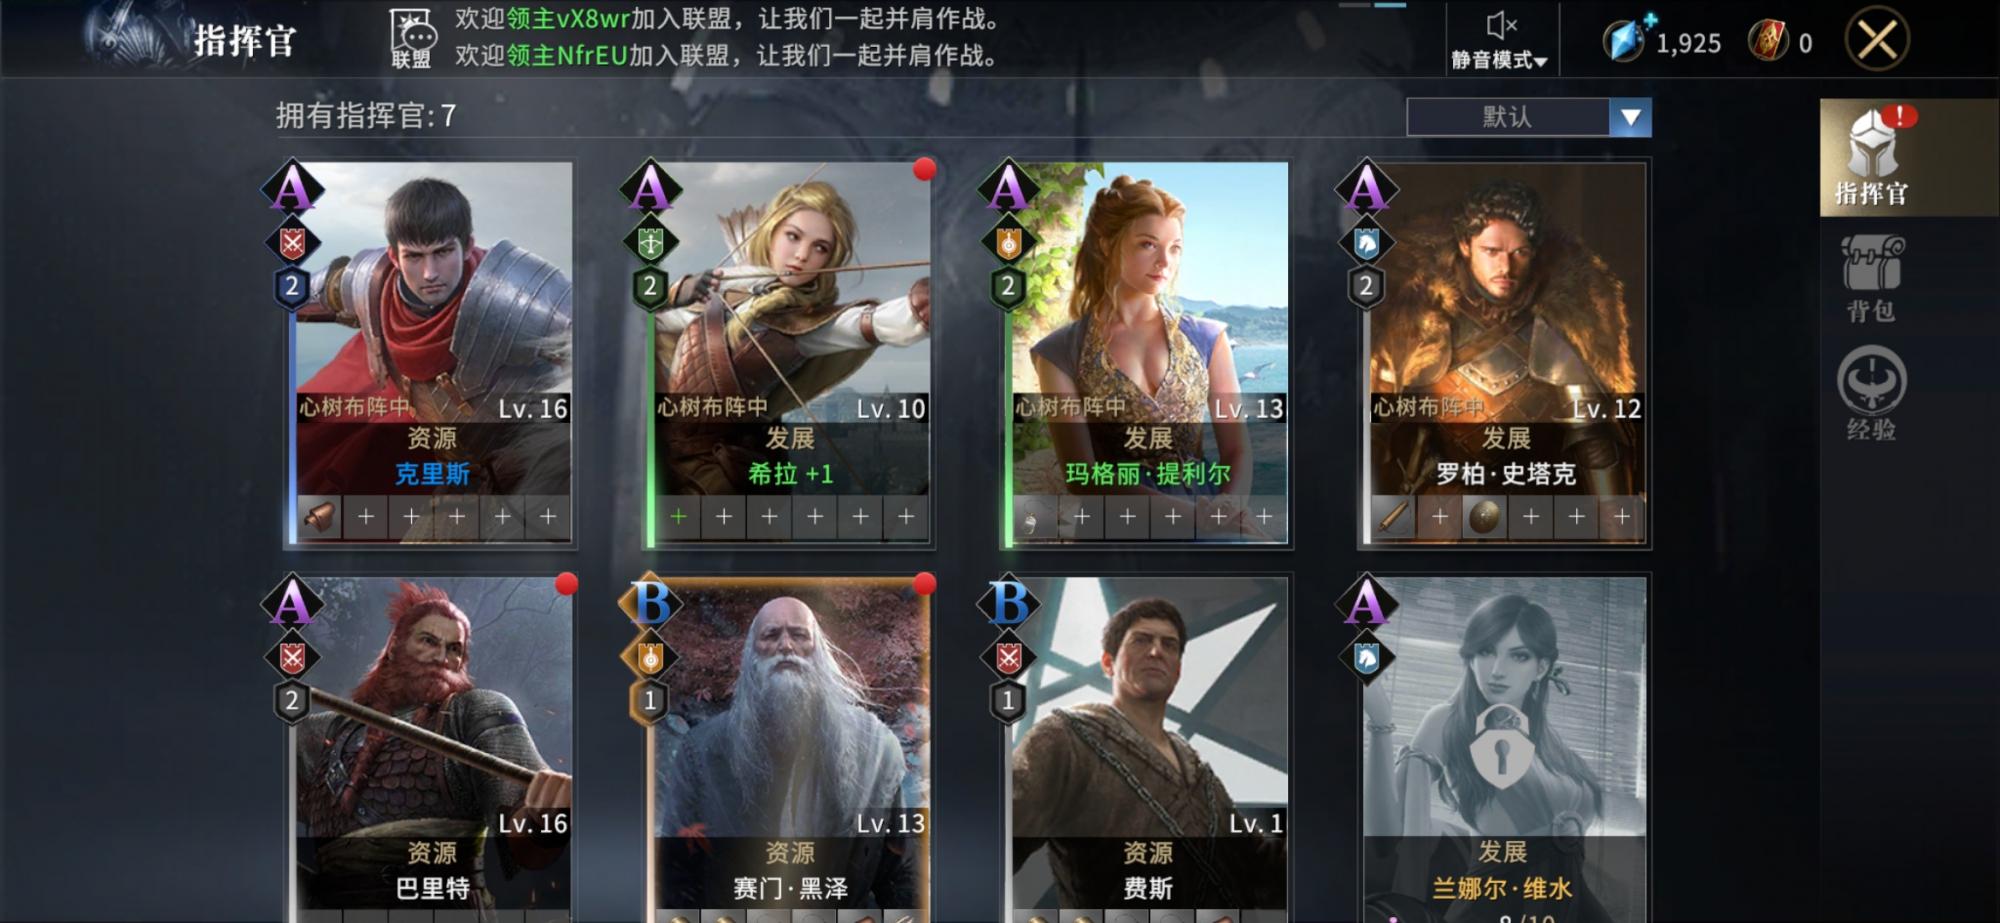 Screenshot_20190717_213108_com.tencent.yoozoo.got.jpg